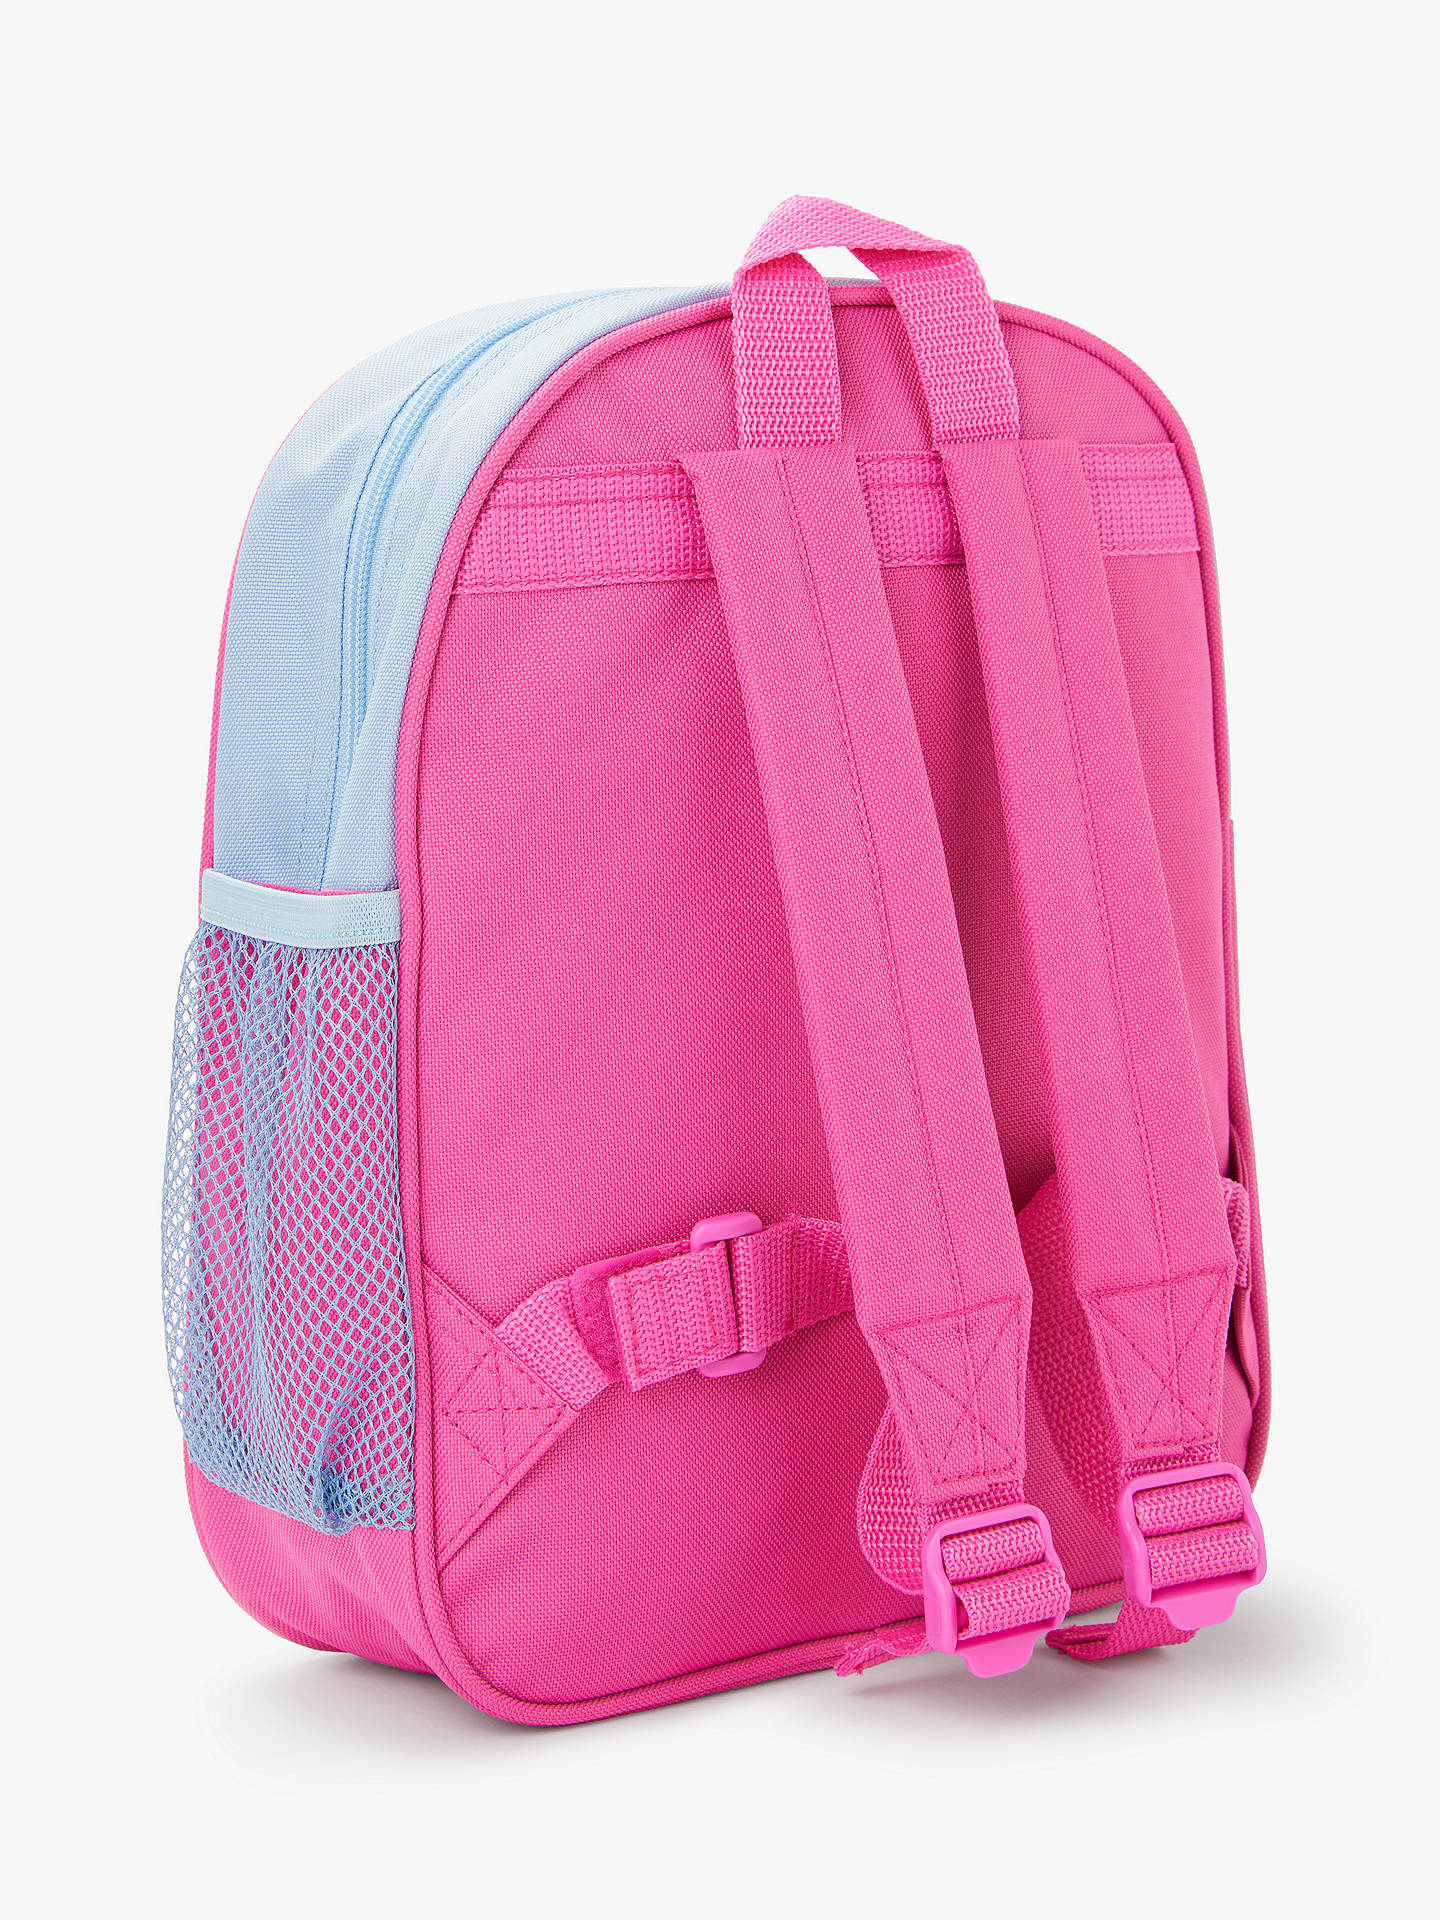 ... BuyJohn Lewis   Partners Unicorn 3D Children s Backpack Online at  johnlewis. ... 9de6e0eecd1ef